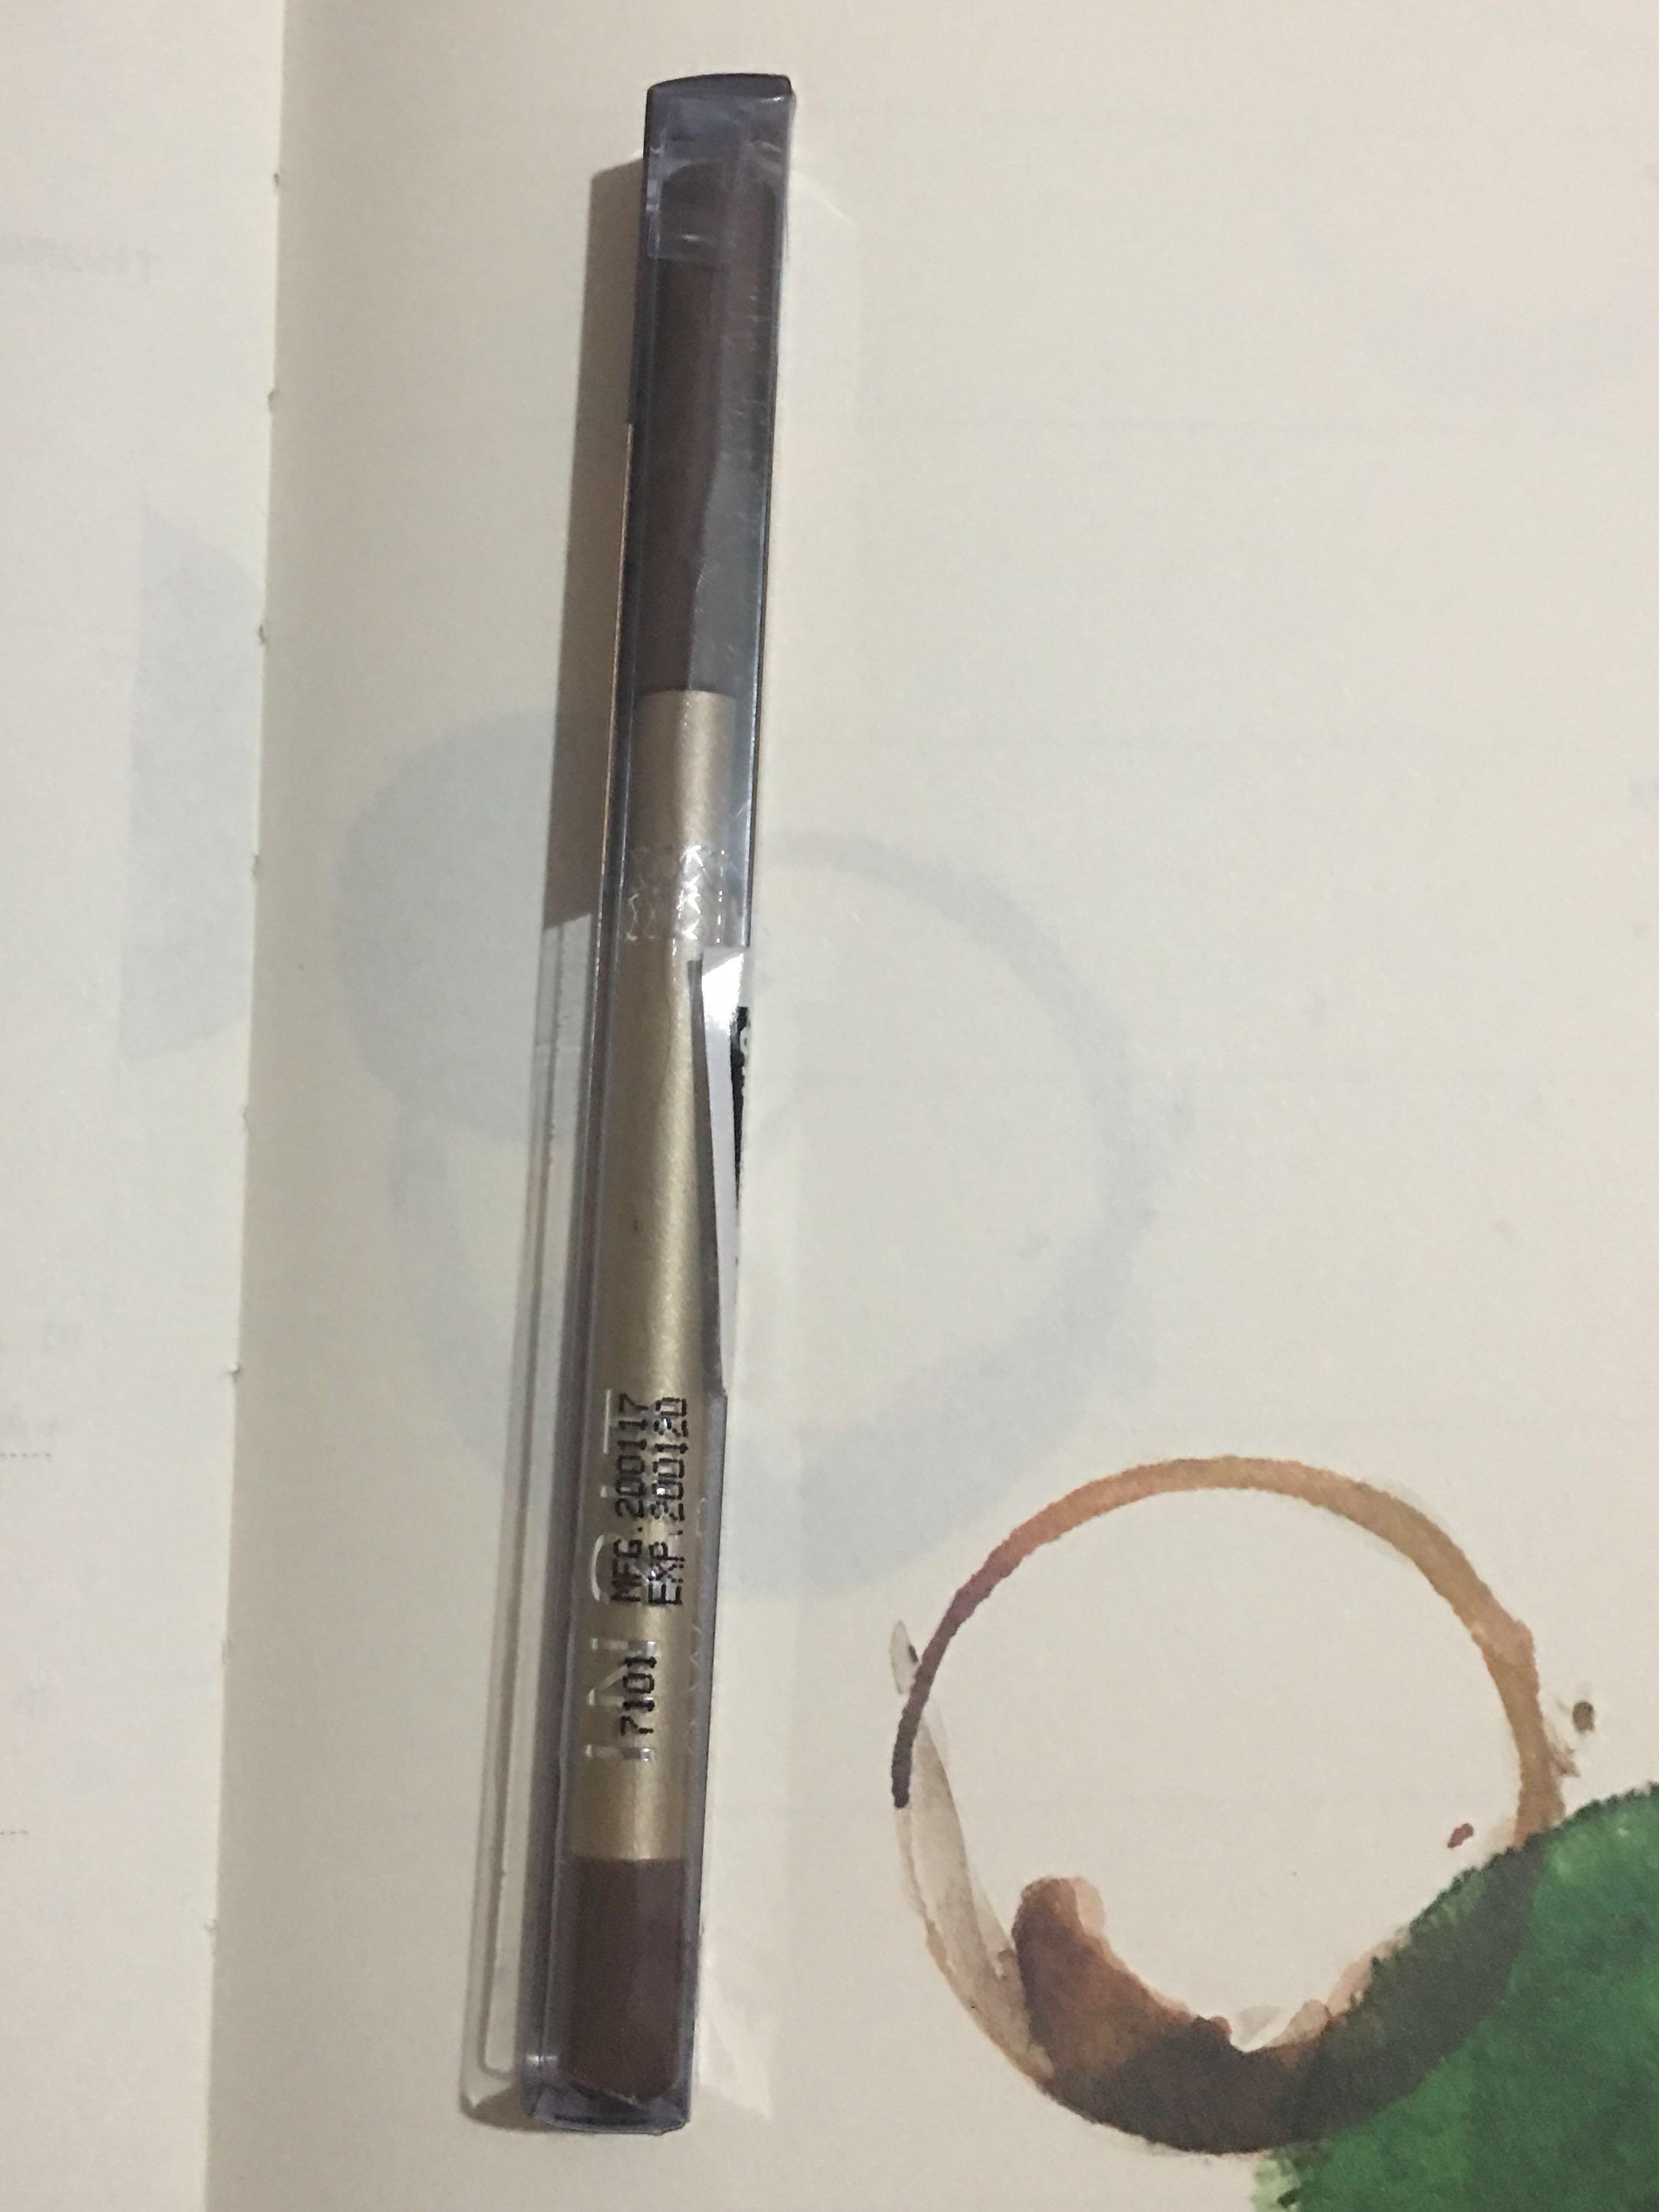 Brandnew 2-Way Waterproof IN2IT Eyebrow Pencil